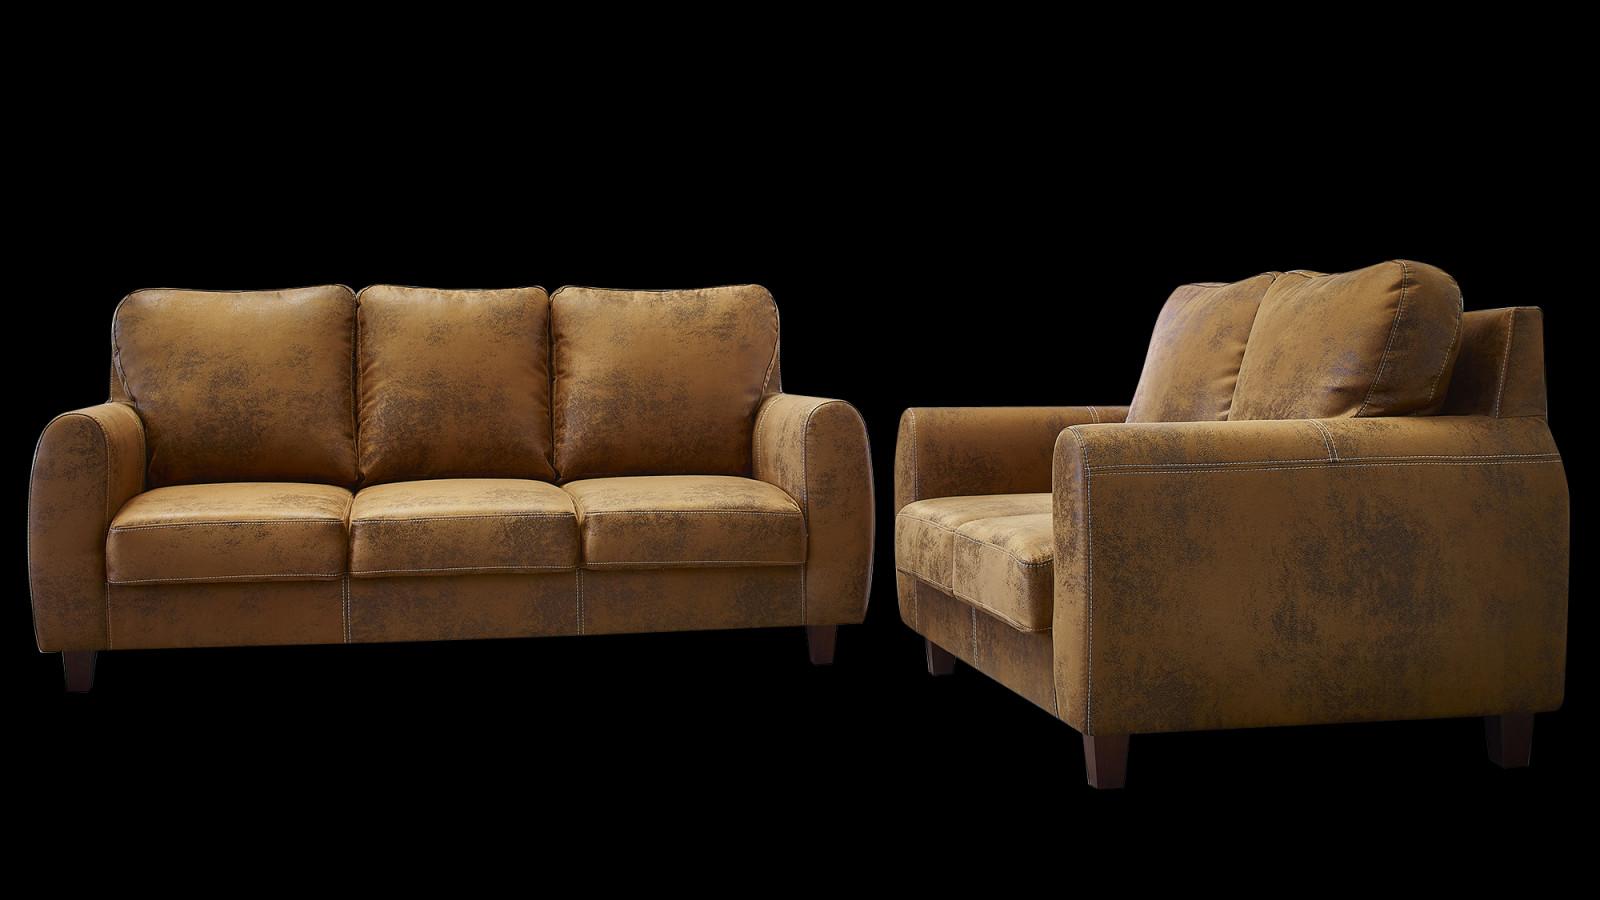 Sofa Set Felicita 3 Seater 2 Seater Sofa Bobochic